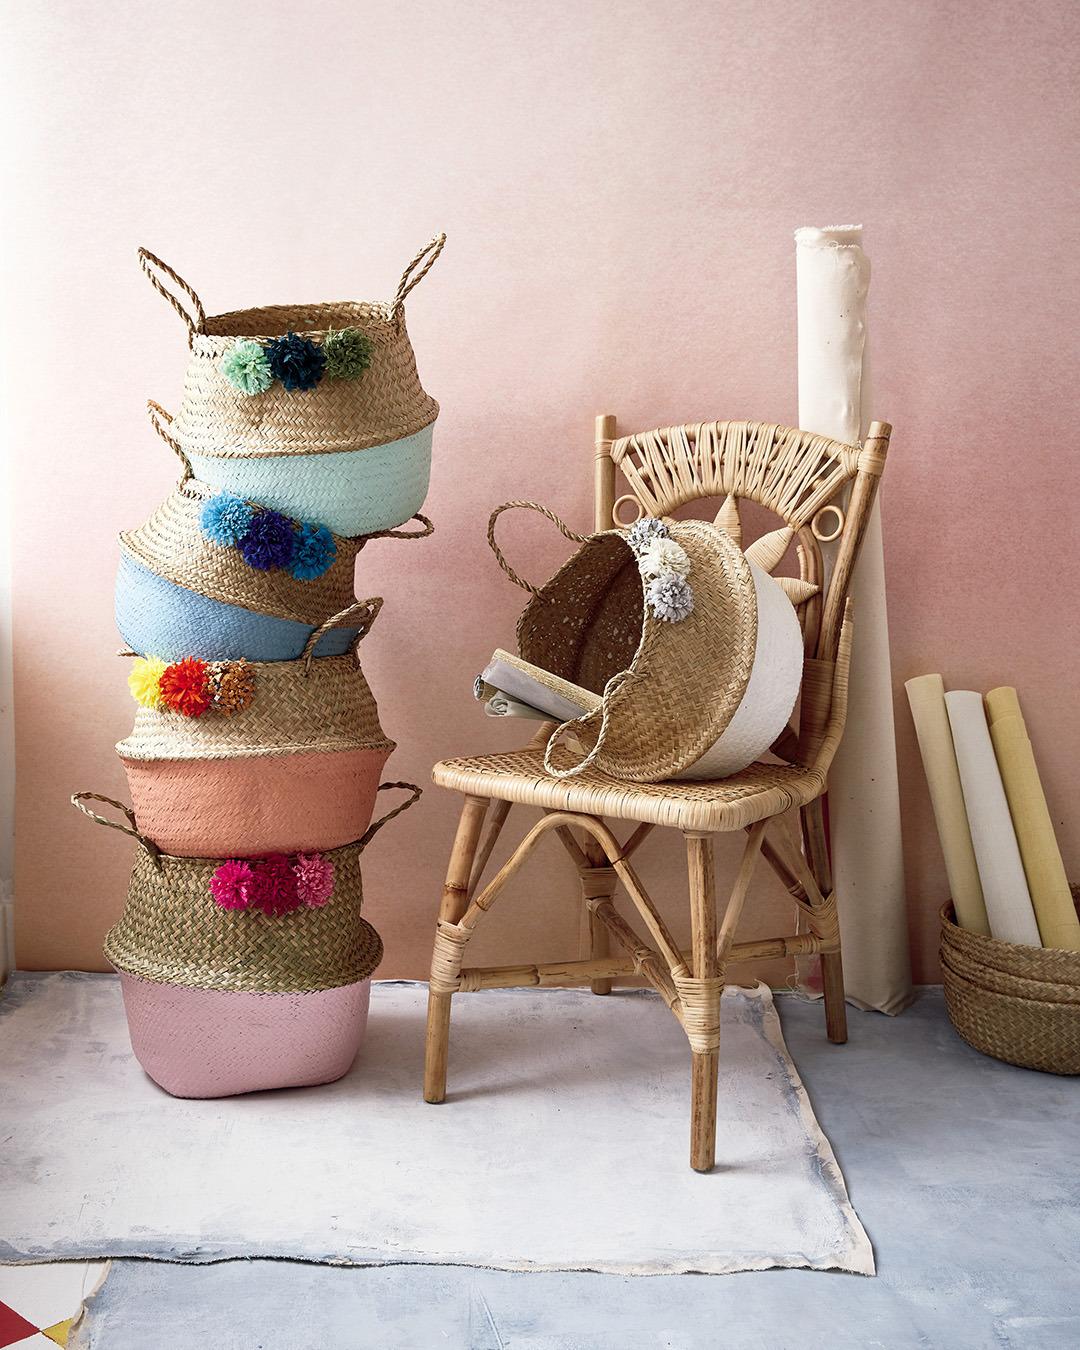 Abrams How To Make Pom Pom Baskets From Craft The